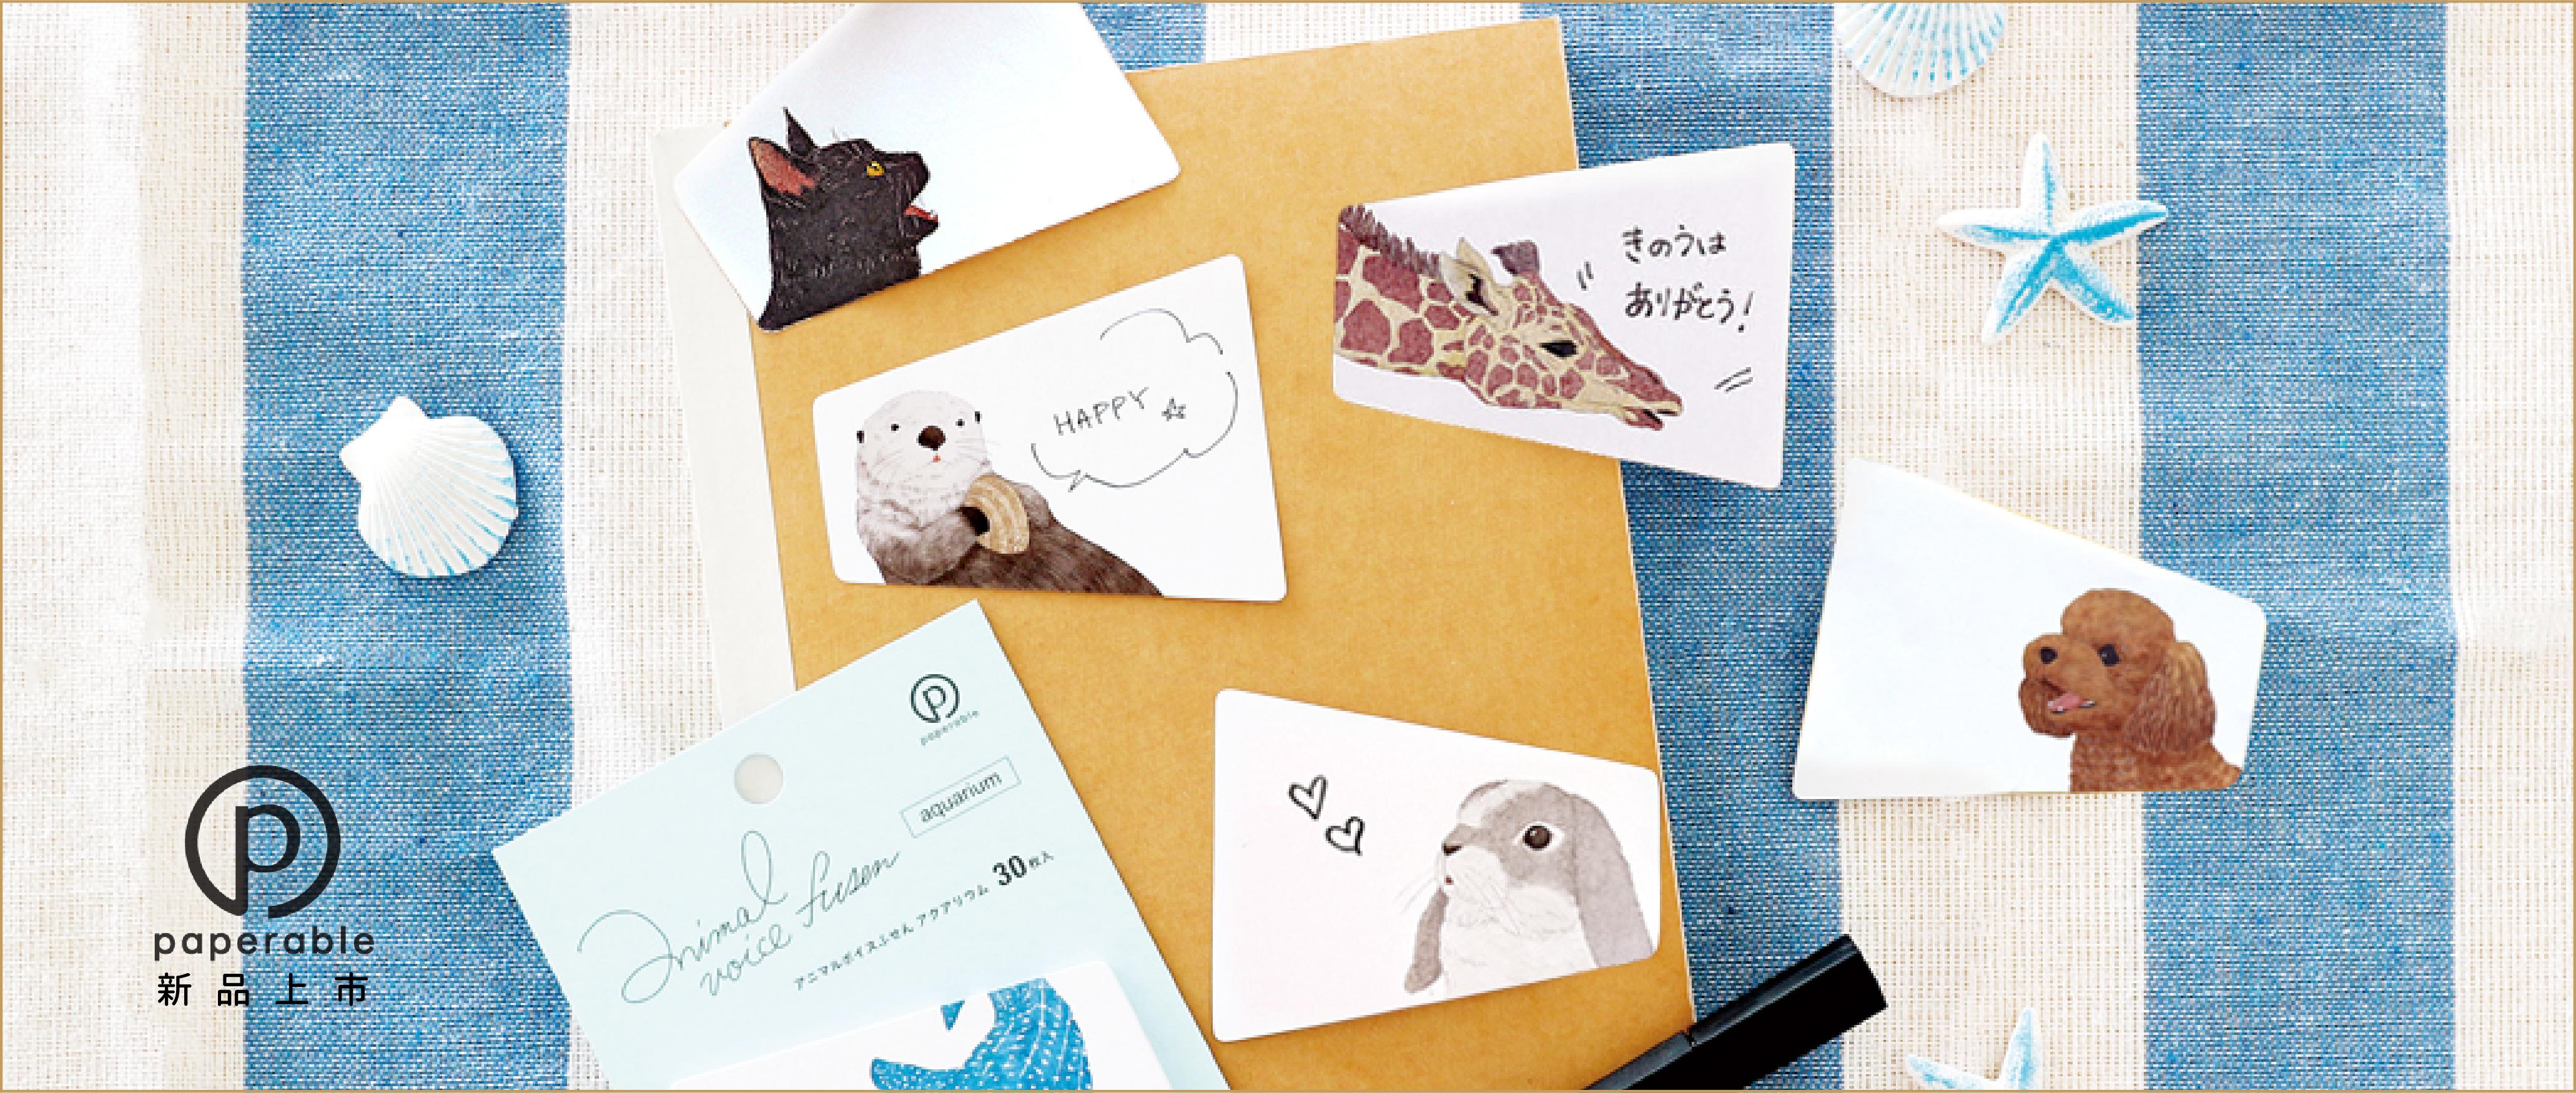 paperable,AnimalVoiceStickyMemos,便條紙